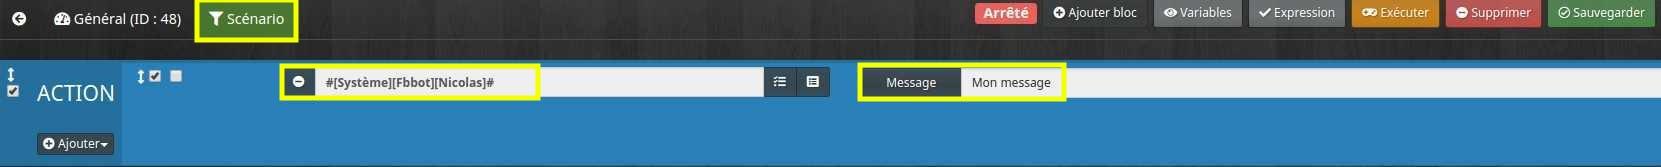 Envoyer un message avec Messenger depuis un scénario Jeedom